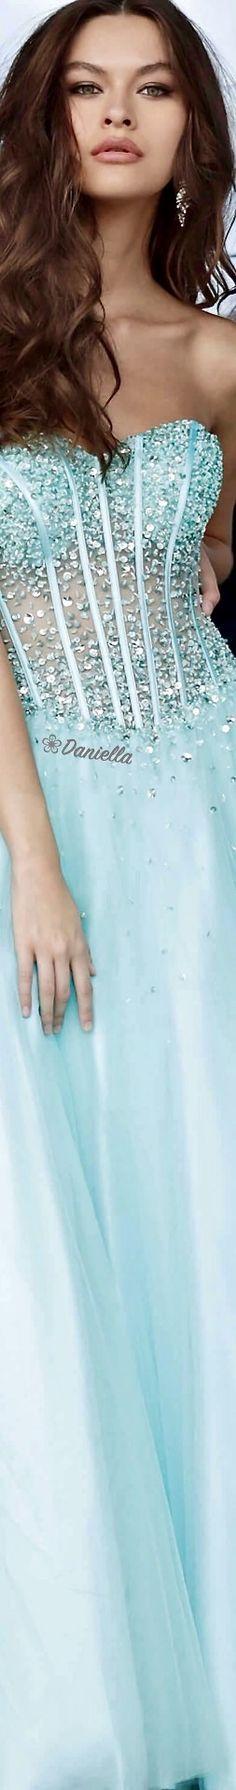 Buy Jovani designer prom, evening and wedding dresses via our authenticated retailer store. Unique Fashion, Womens Fashion, Fashion Design, Turquoise Fashion, Mint Color, Swimwear Fashion, Amazing Women, Designer Dresses, Fashion Beauty